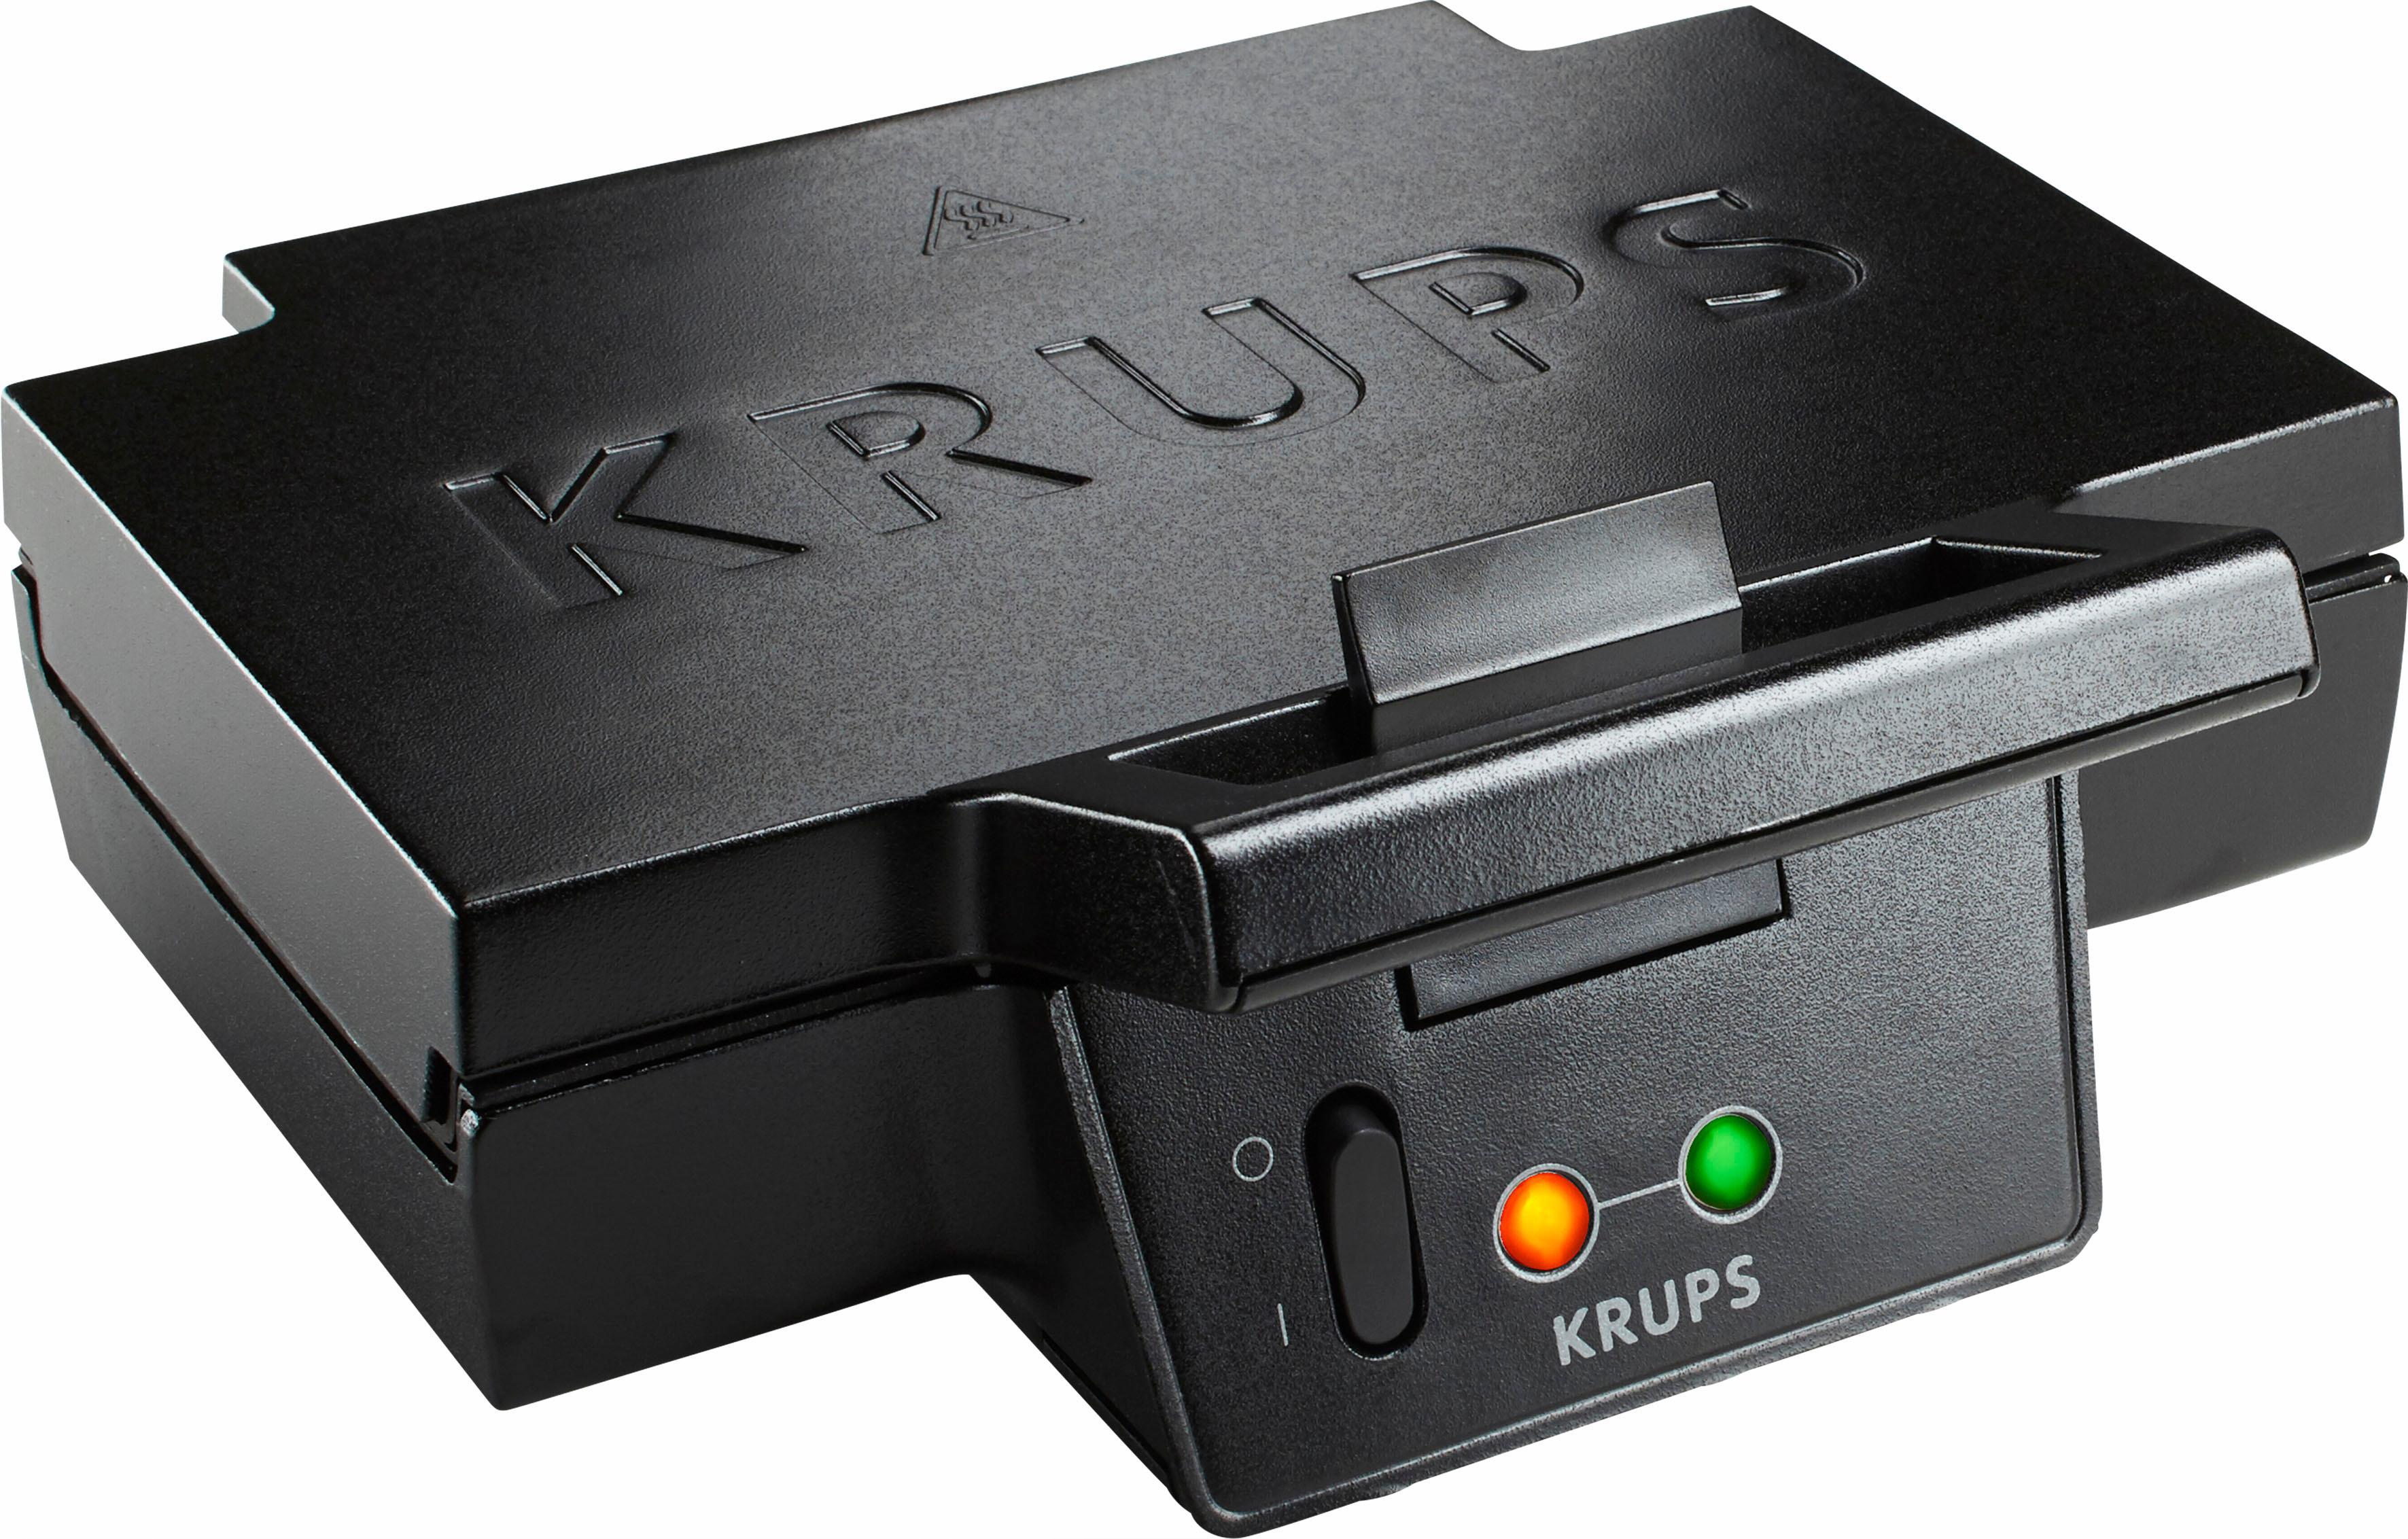 Krups-Sandwichmaker-FDK451-Sandwich-Toaster-850-Watt-Technik-amp-Freizeit